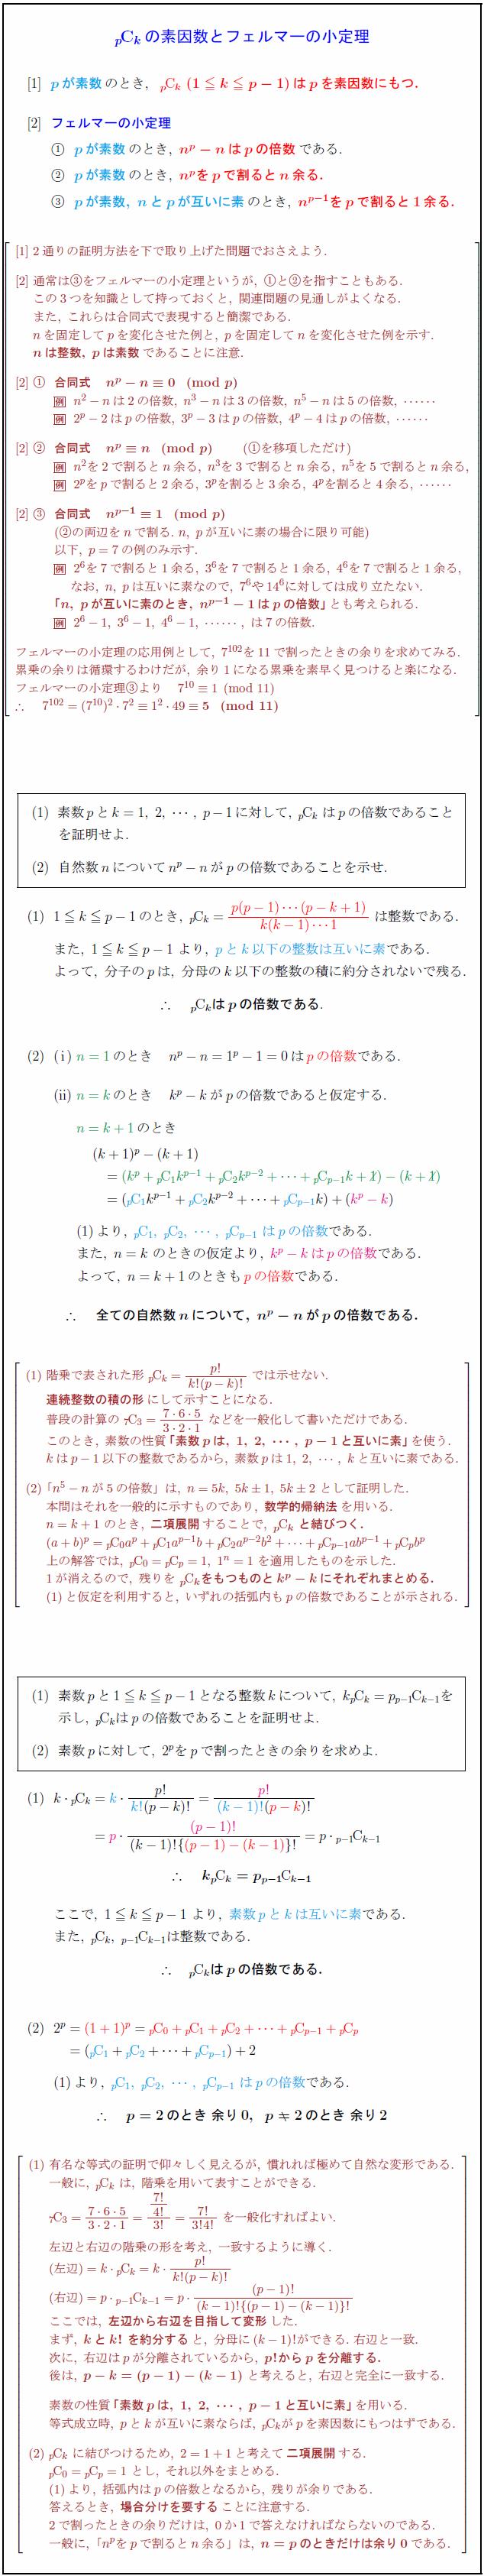 fermat-little-theorem